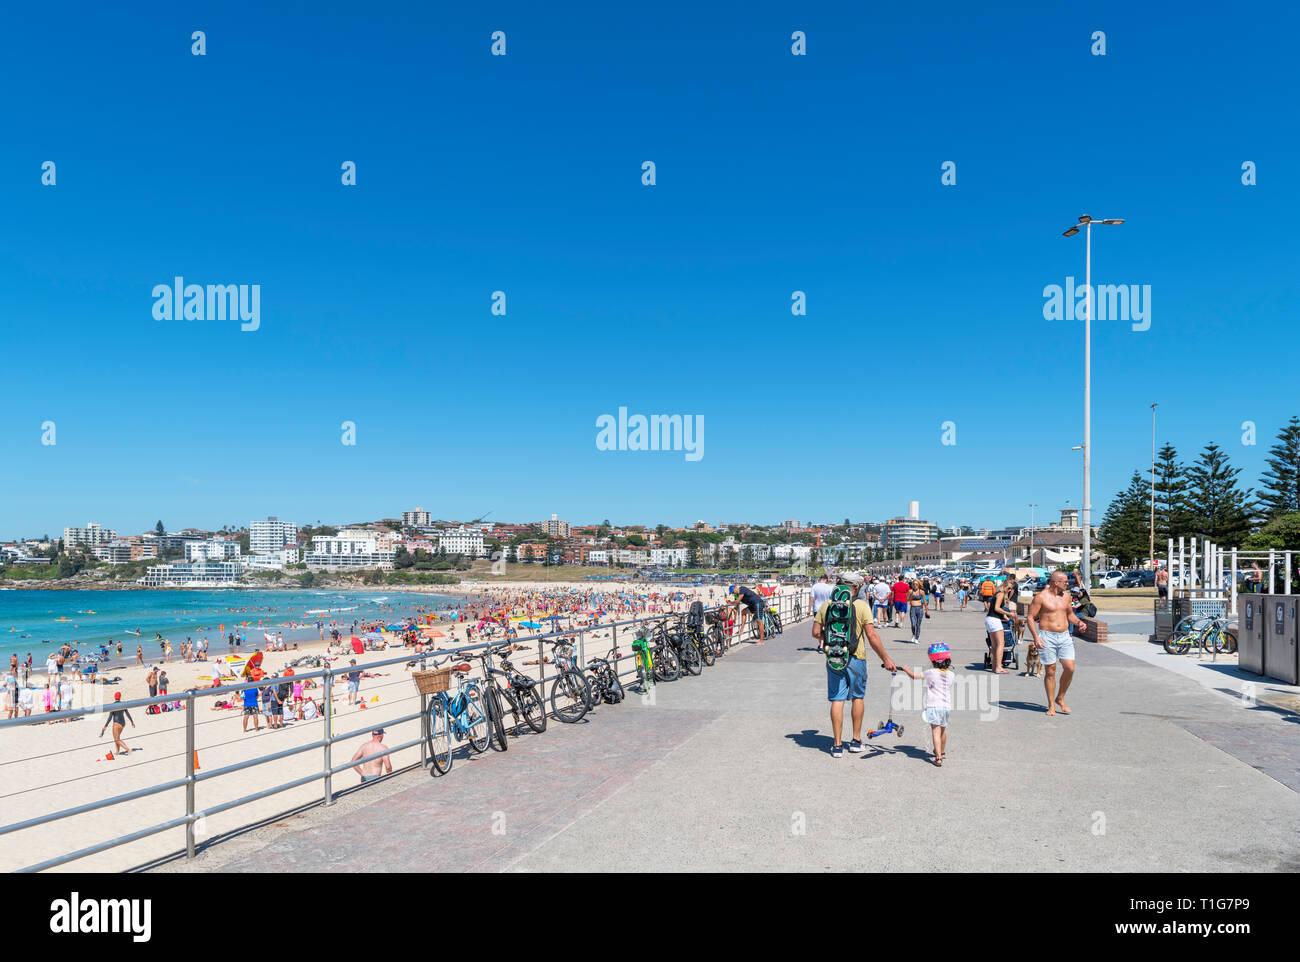 Promenade at Bondi Beach, Sydney, New South Wales, Australia - Stock Image